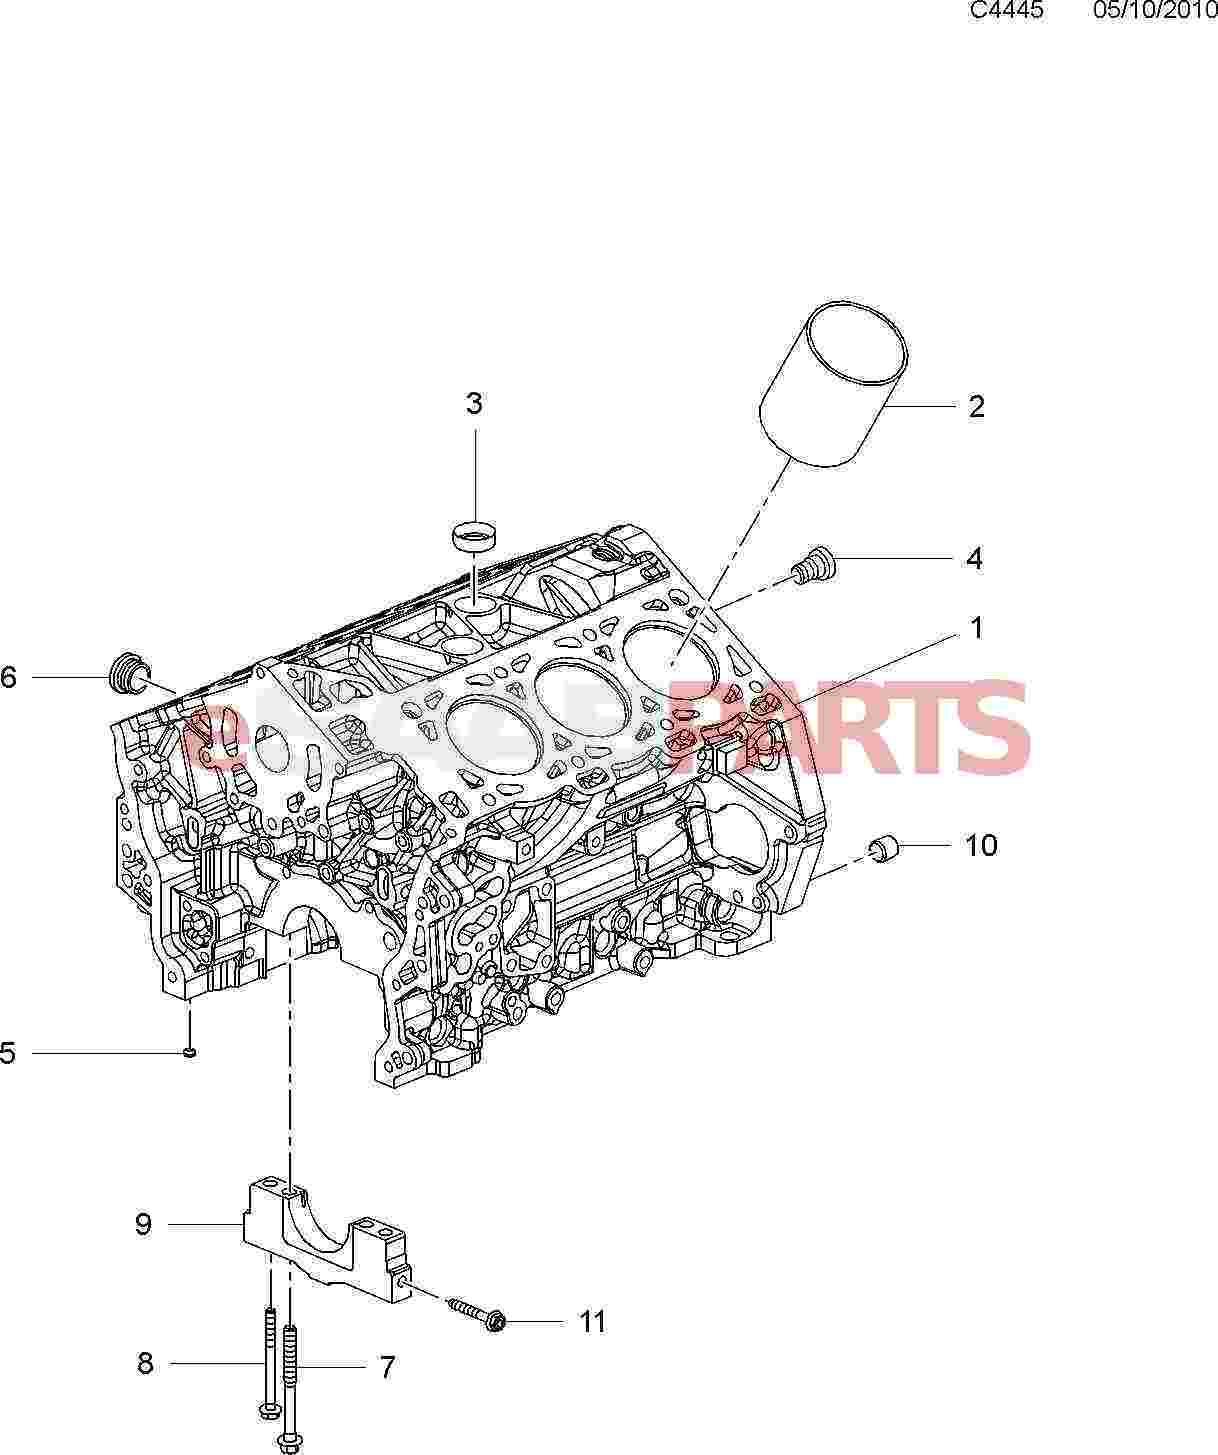 2009 Saab 9 7X Engine Diagram - Lir Wiring 101 Saab X Wiring Diagram on saab 9-3x, saab 9-6, saab 900i, saab 900se, saab 9 twin turbo, saab sonett 2, saab trailblazer, saab 9x7,